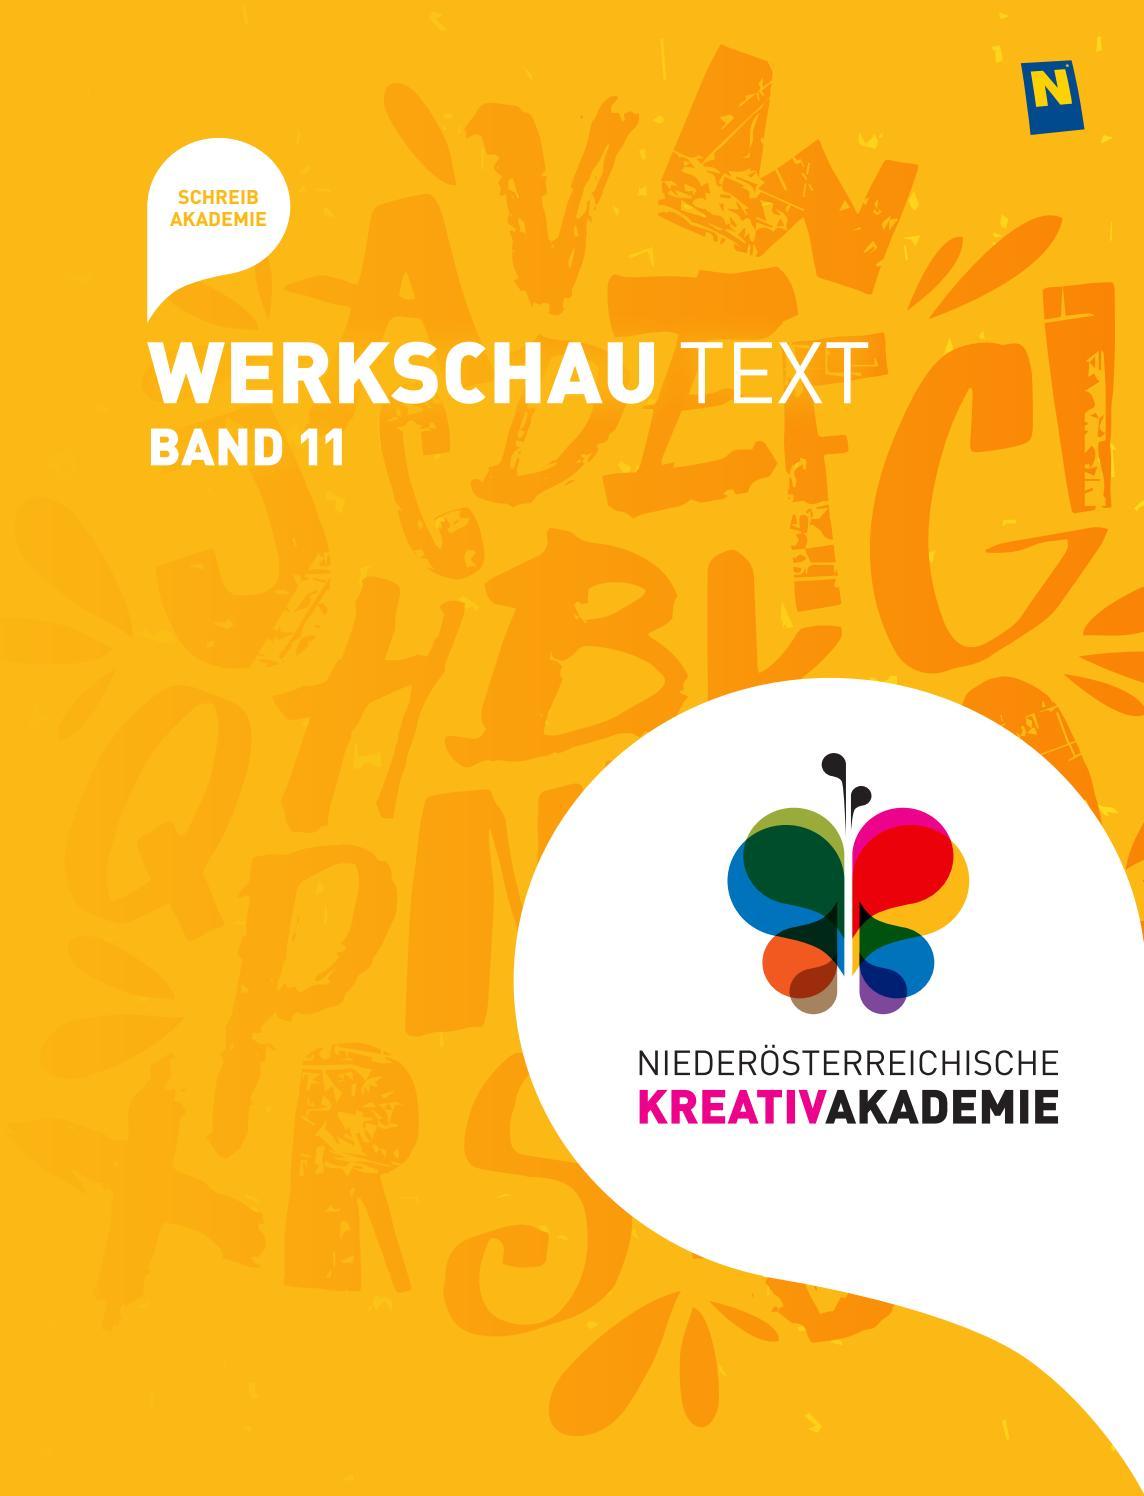 Werkschau Text Band 11 by NÖ KREATIV GmbH - issuu